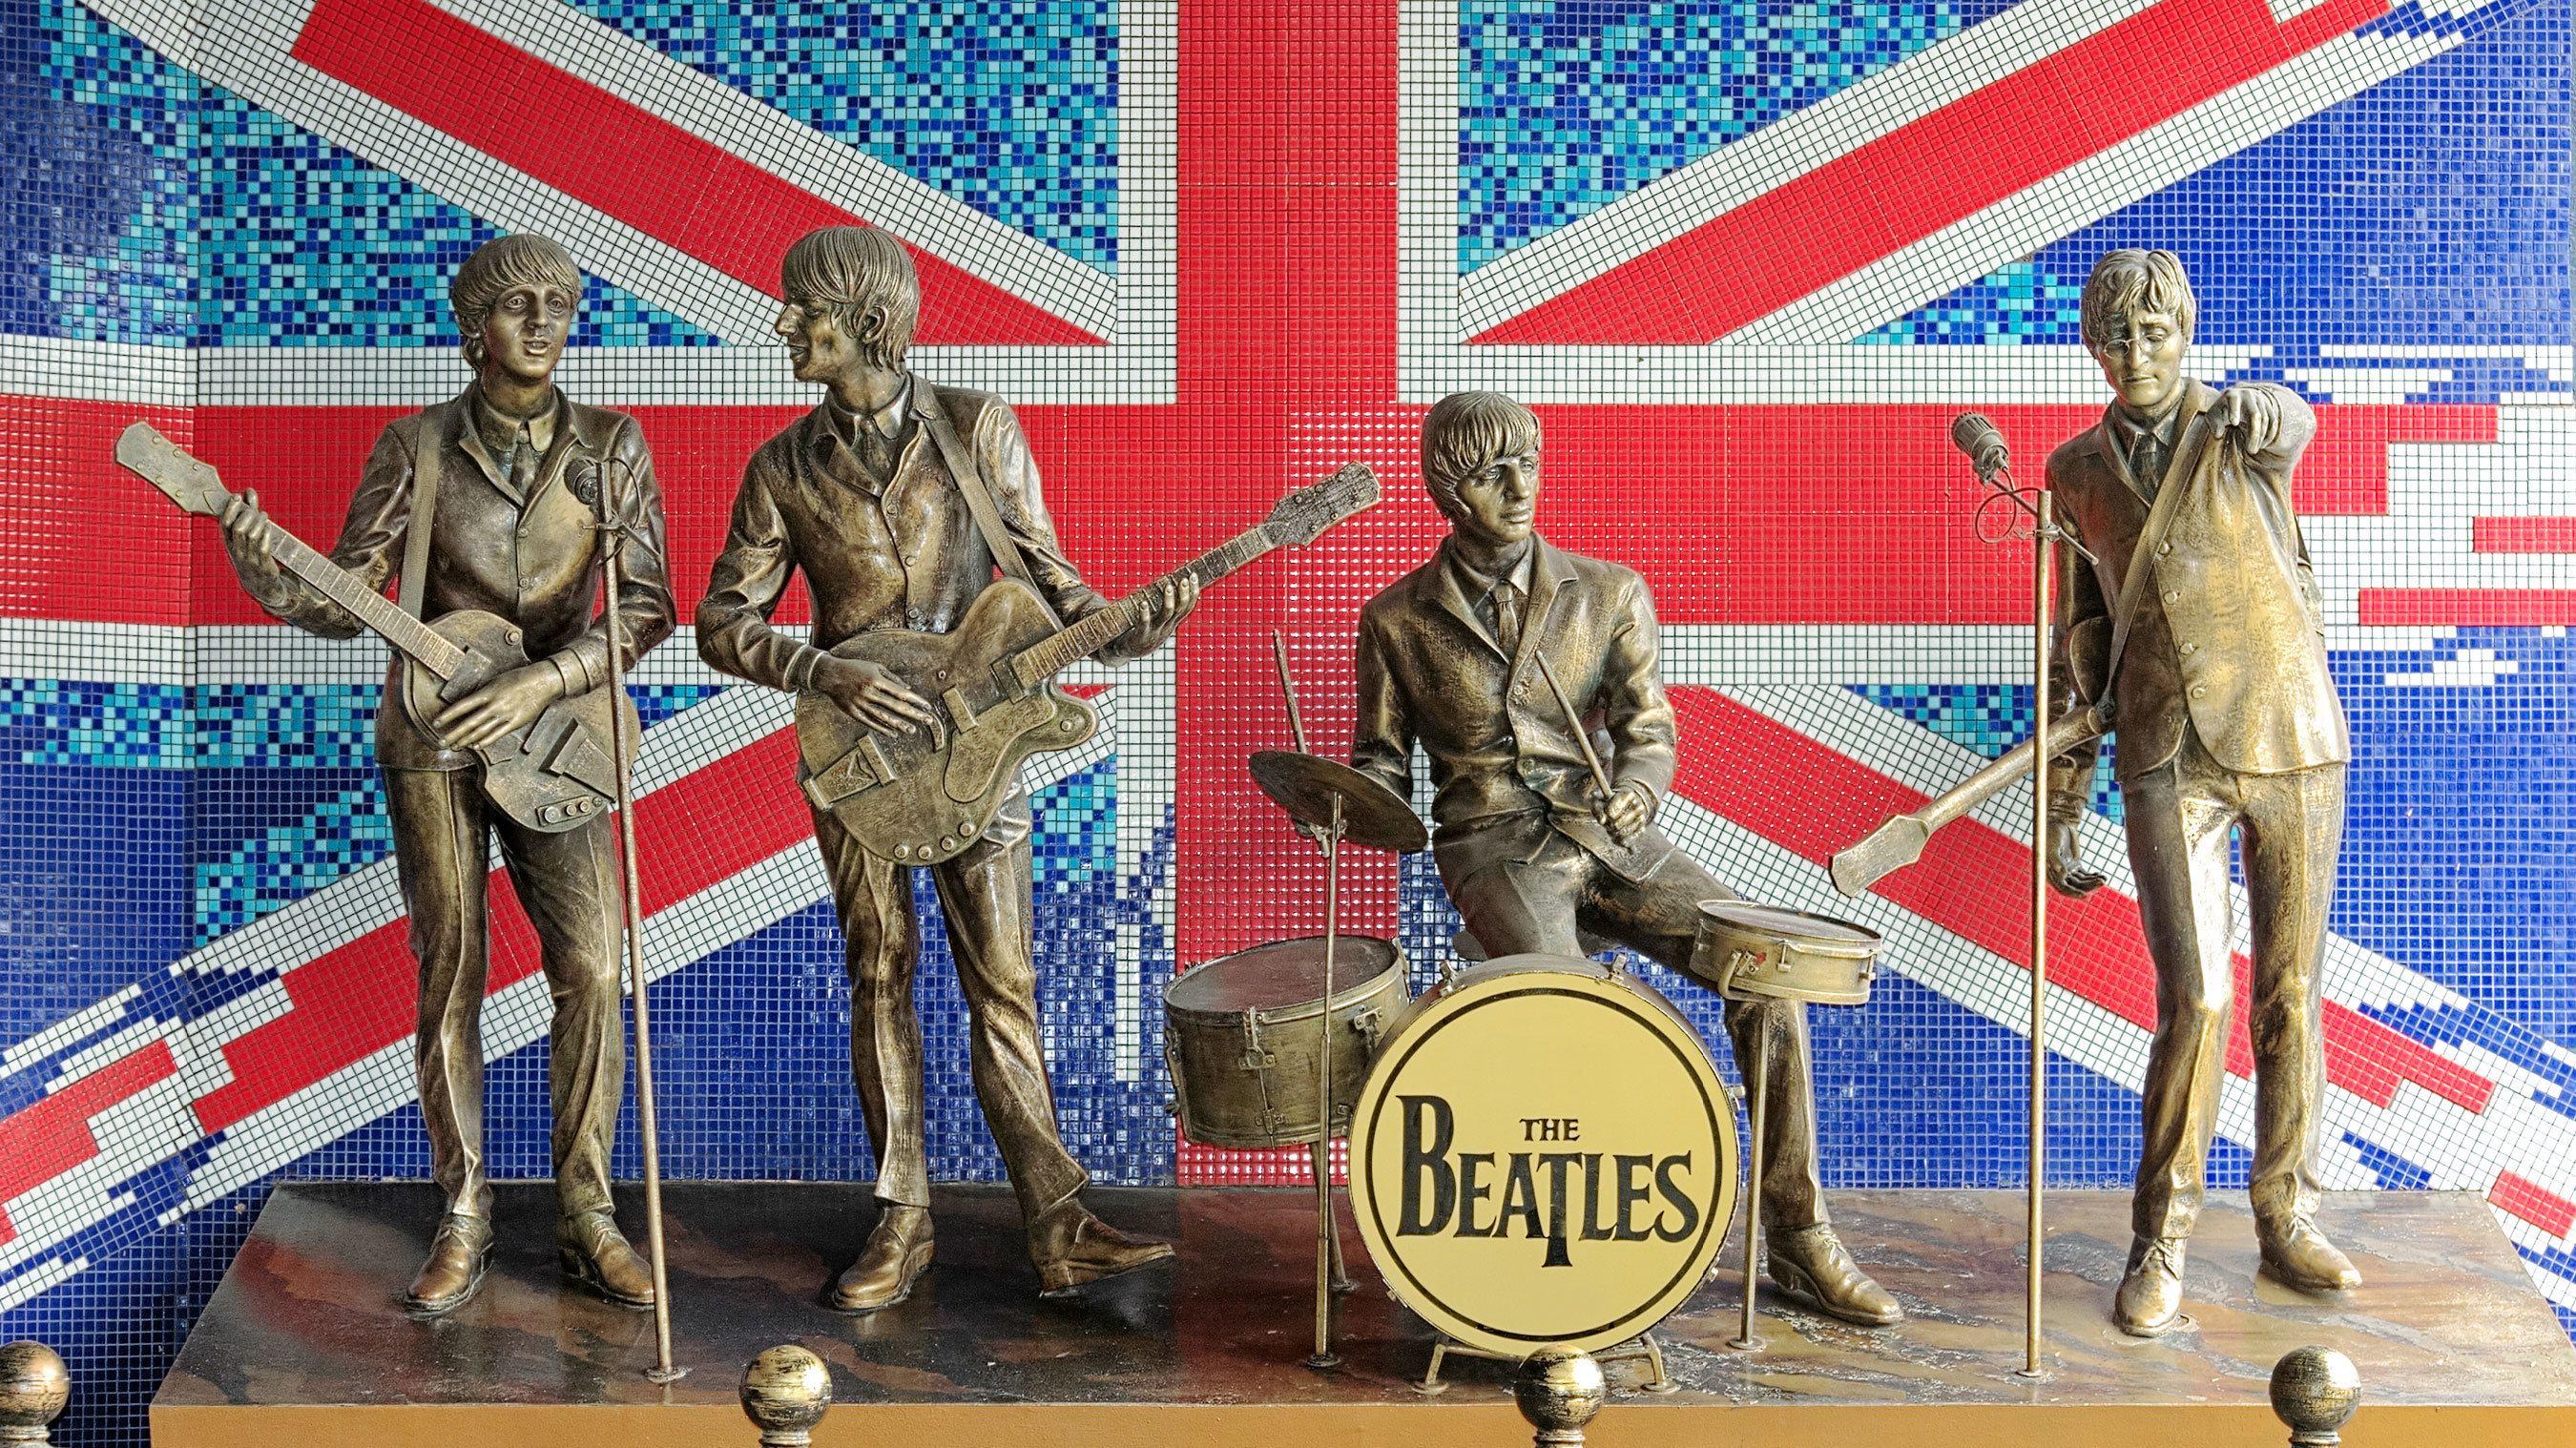 bronze statutes of Beetle rock Band in London